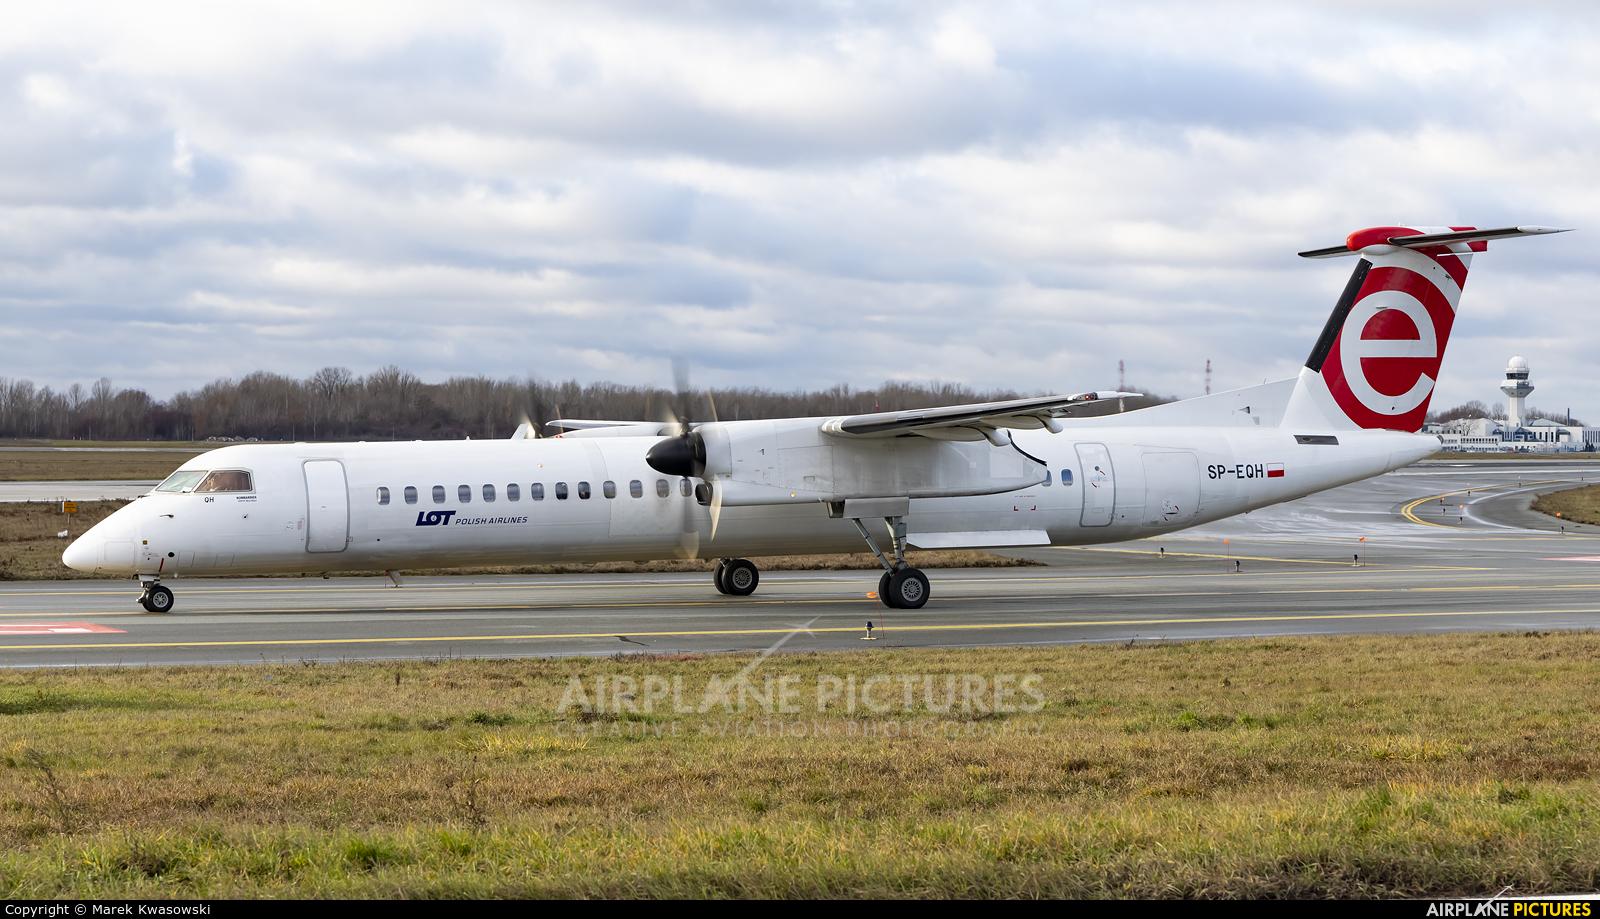 LOT - Polish Airlines SP-EQH aircraft at Warsaw - Frederic Chopin